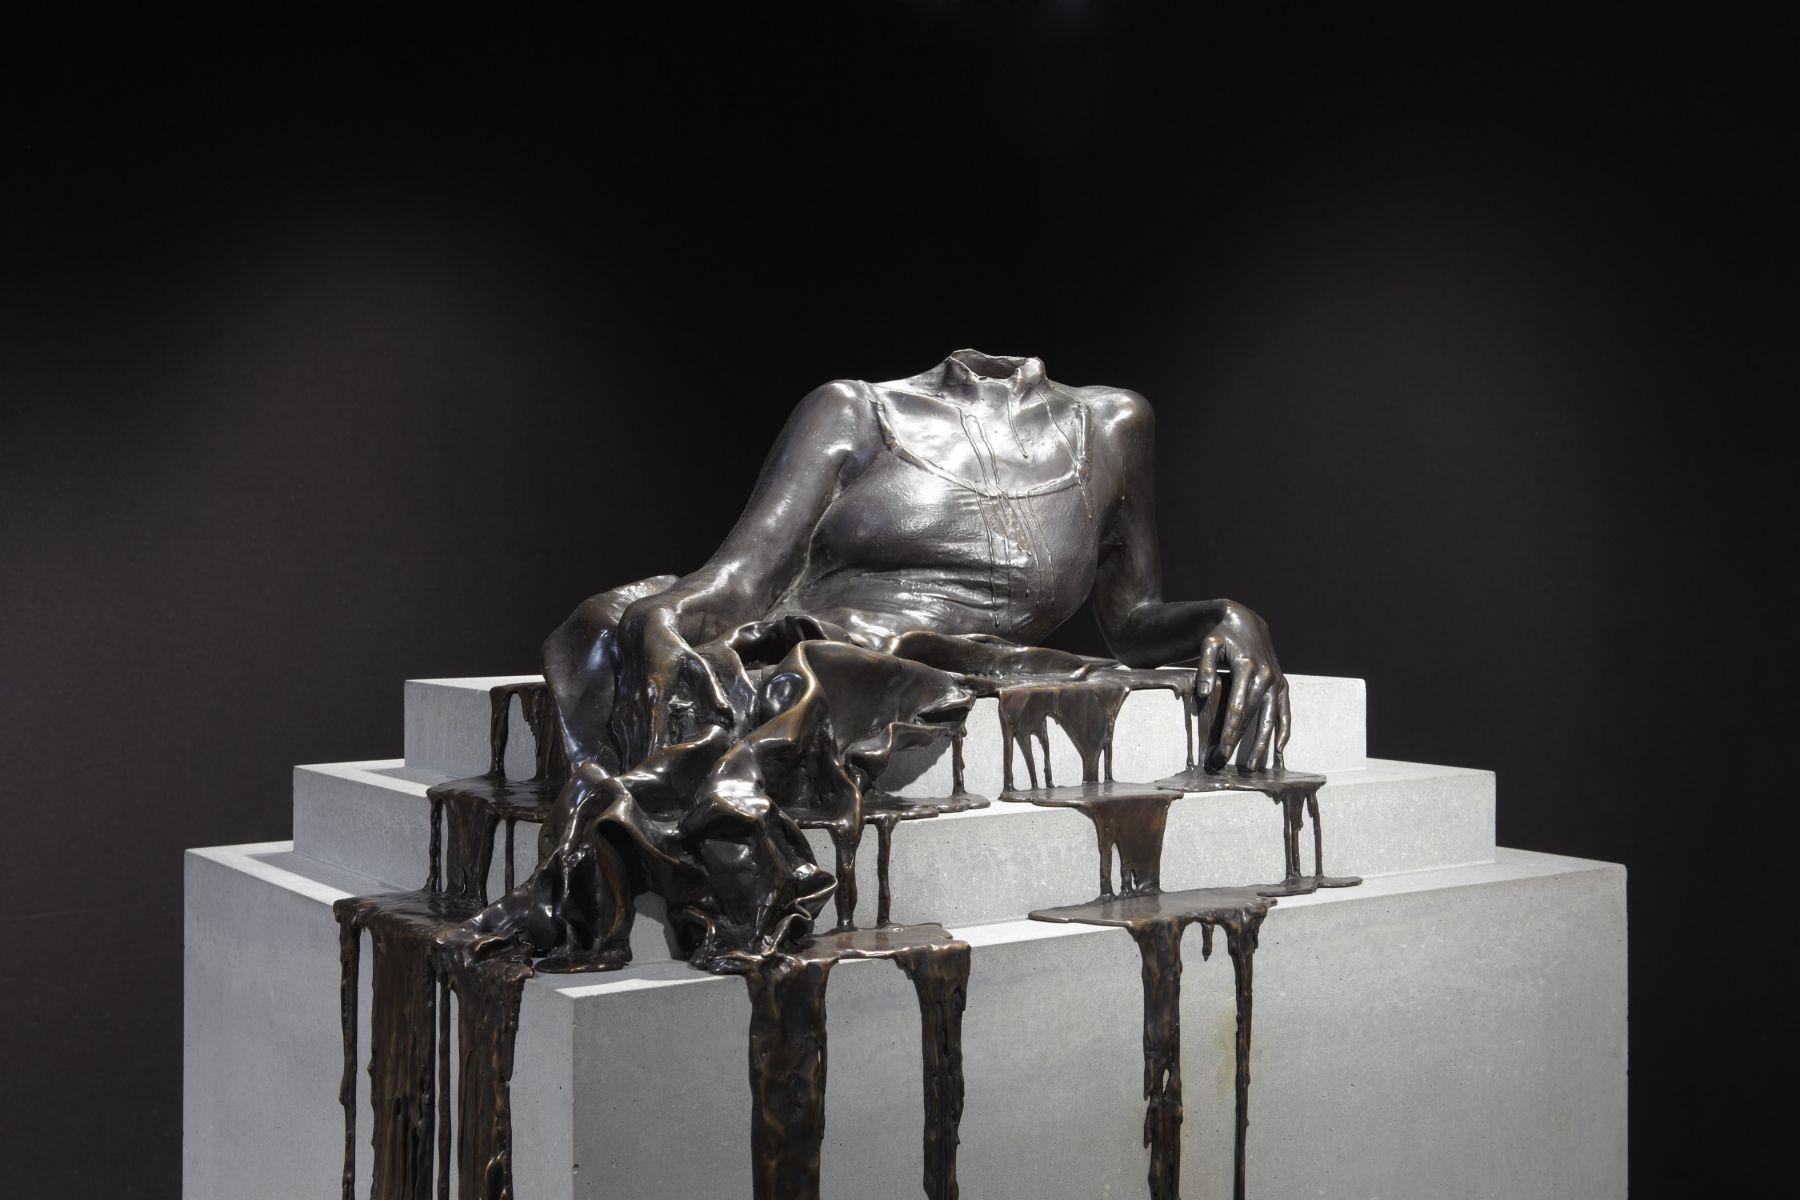 a bronze sculpture of a headless woman dripping off a pedestal by Diana Al-Hadid